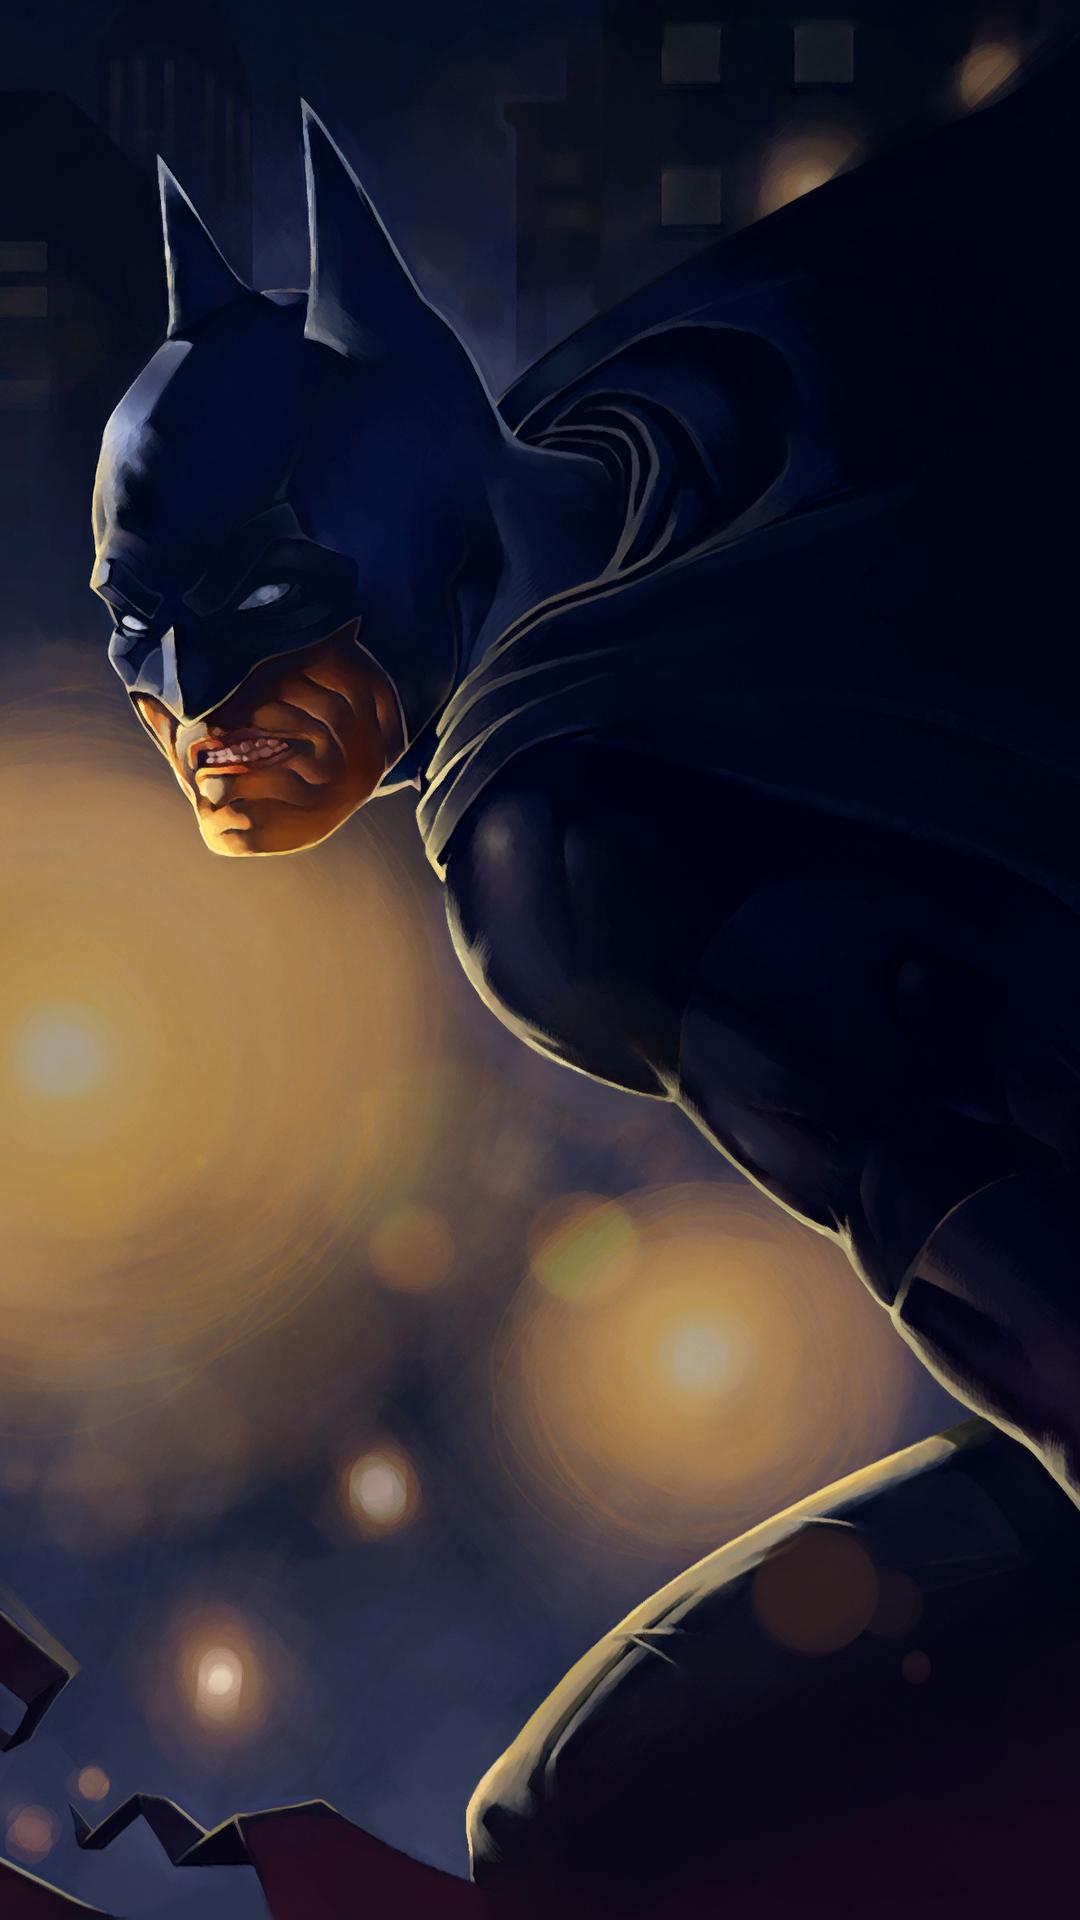 batman-knight-art-rv.jpg